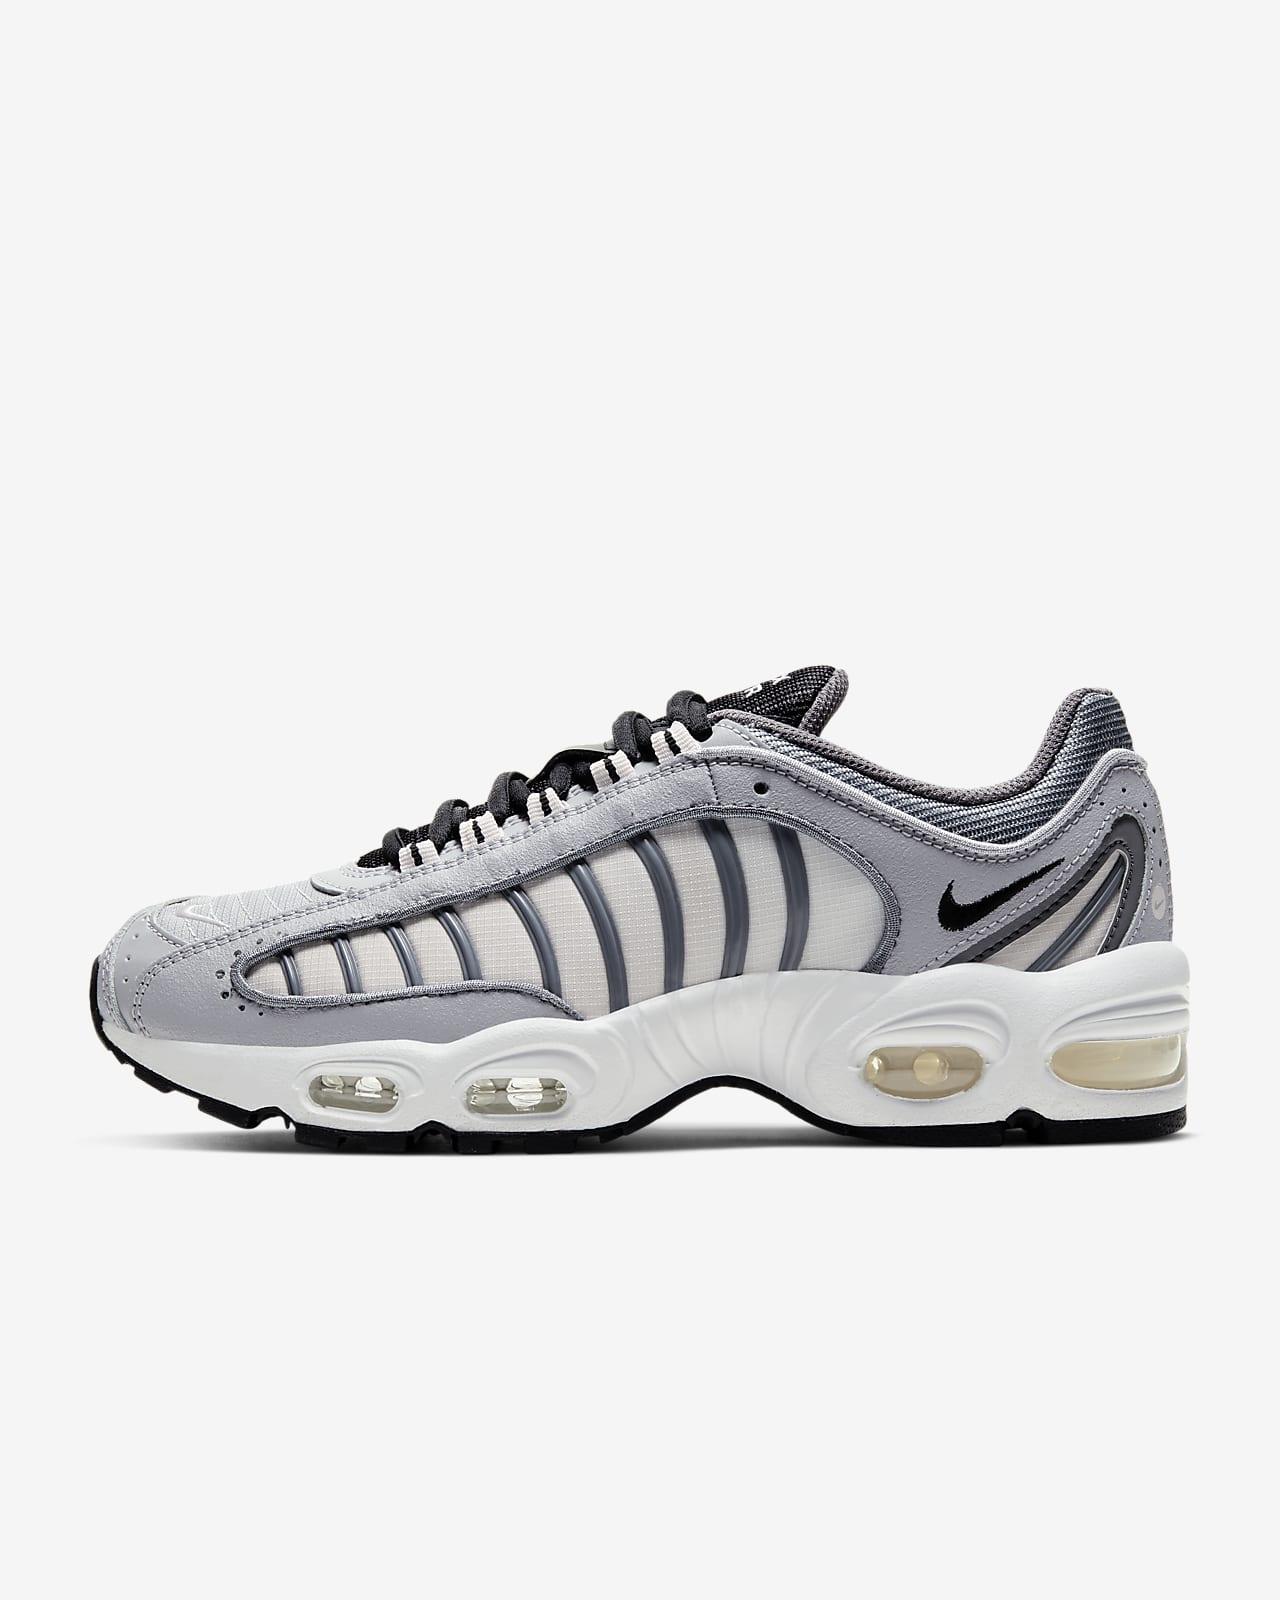 4 9 | Nike Air Max | Sneakers & sko | JD Sports